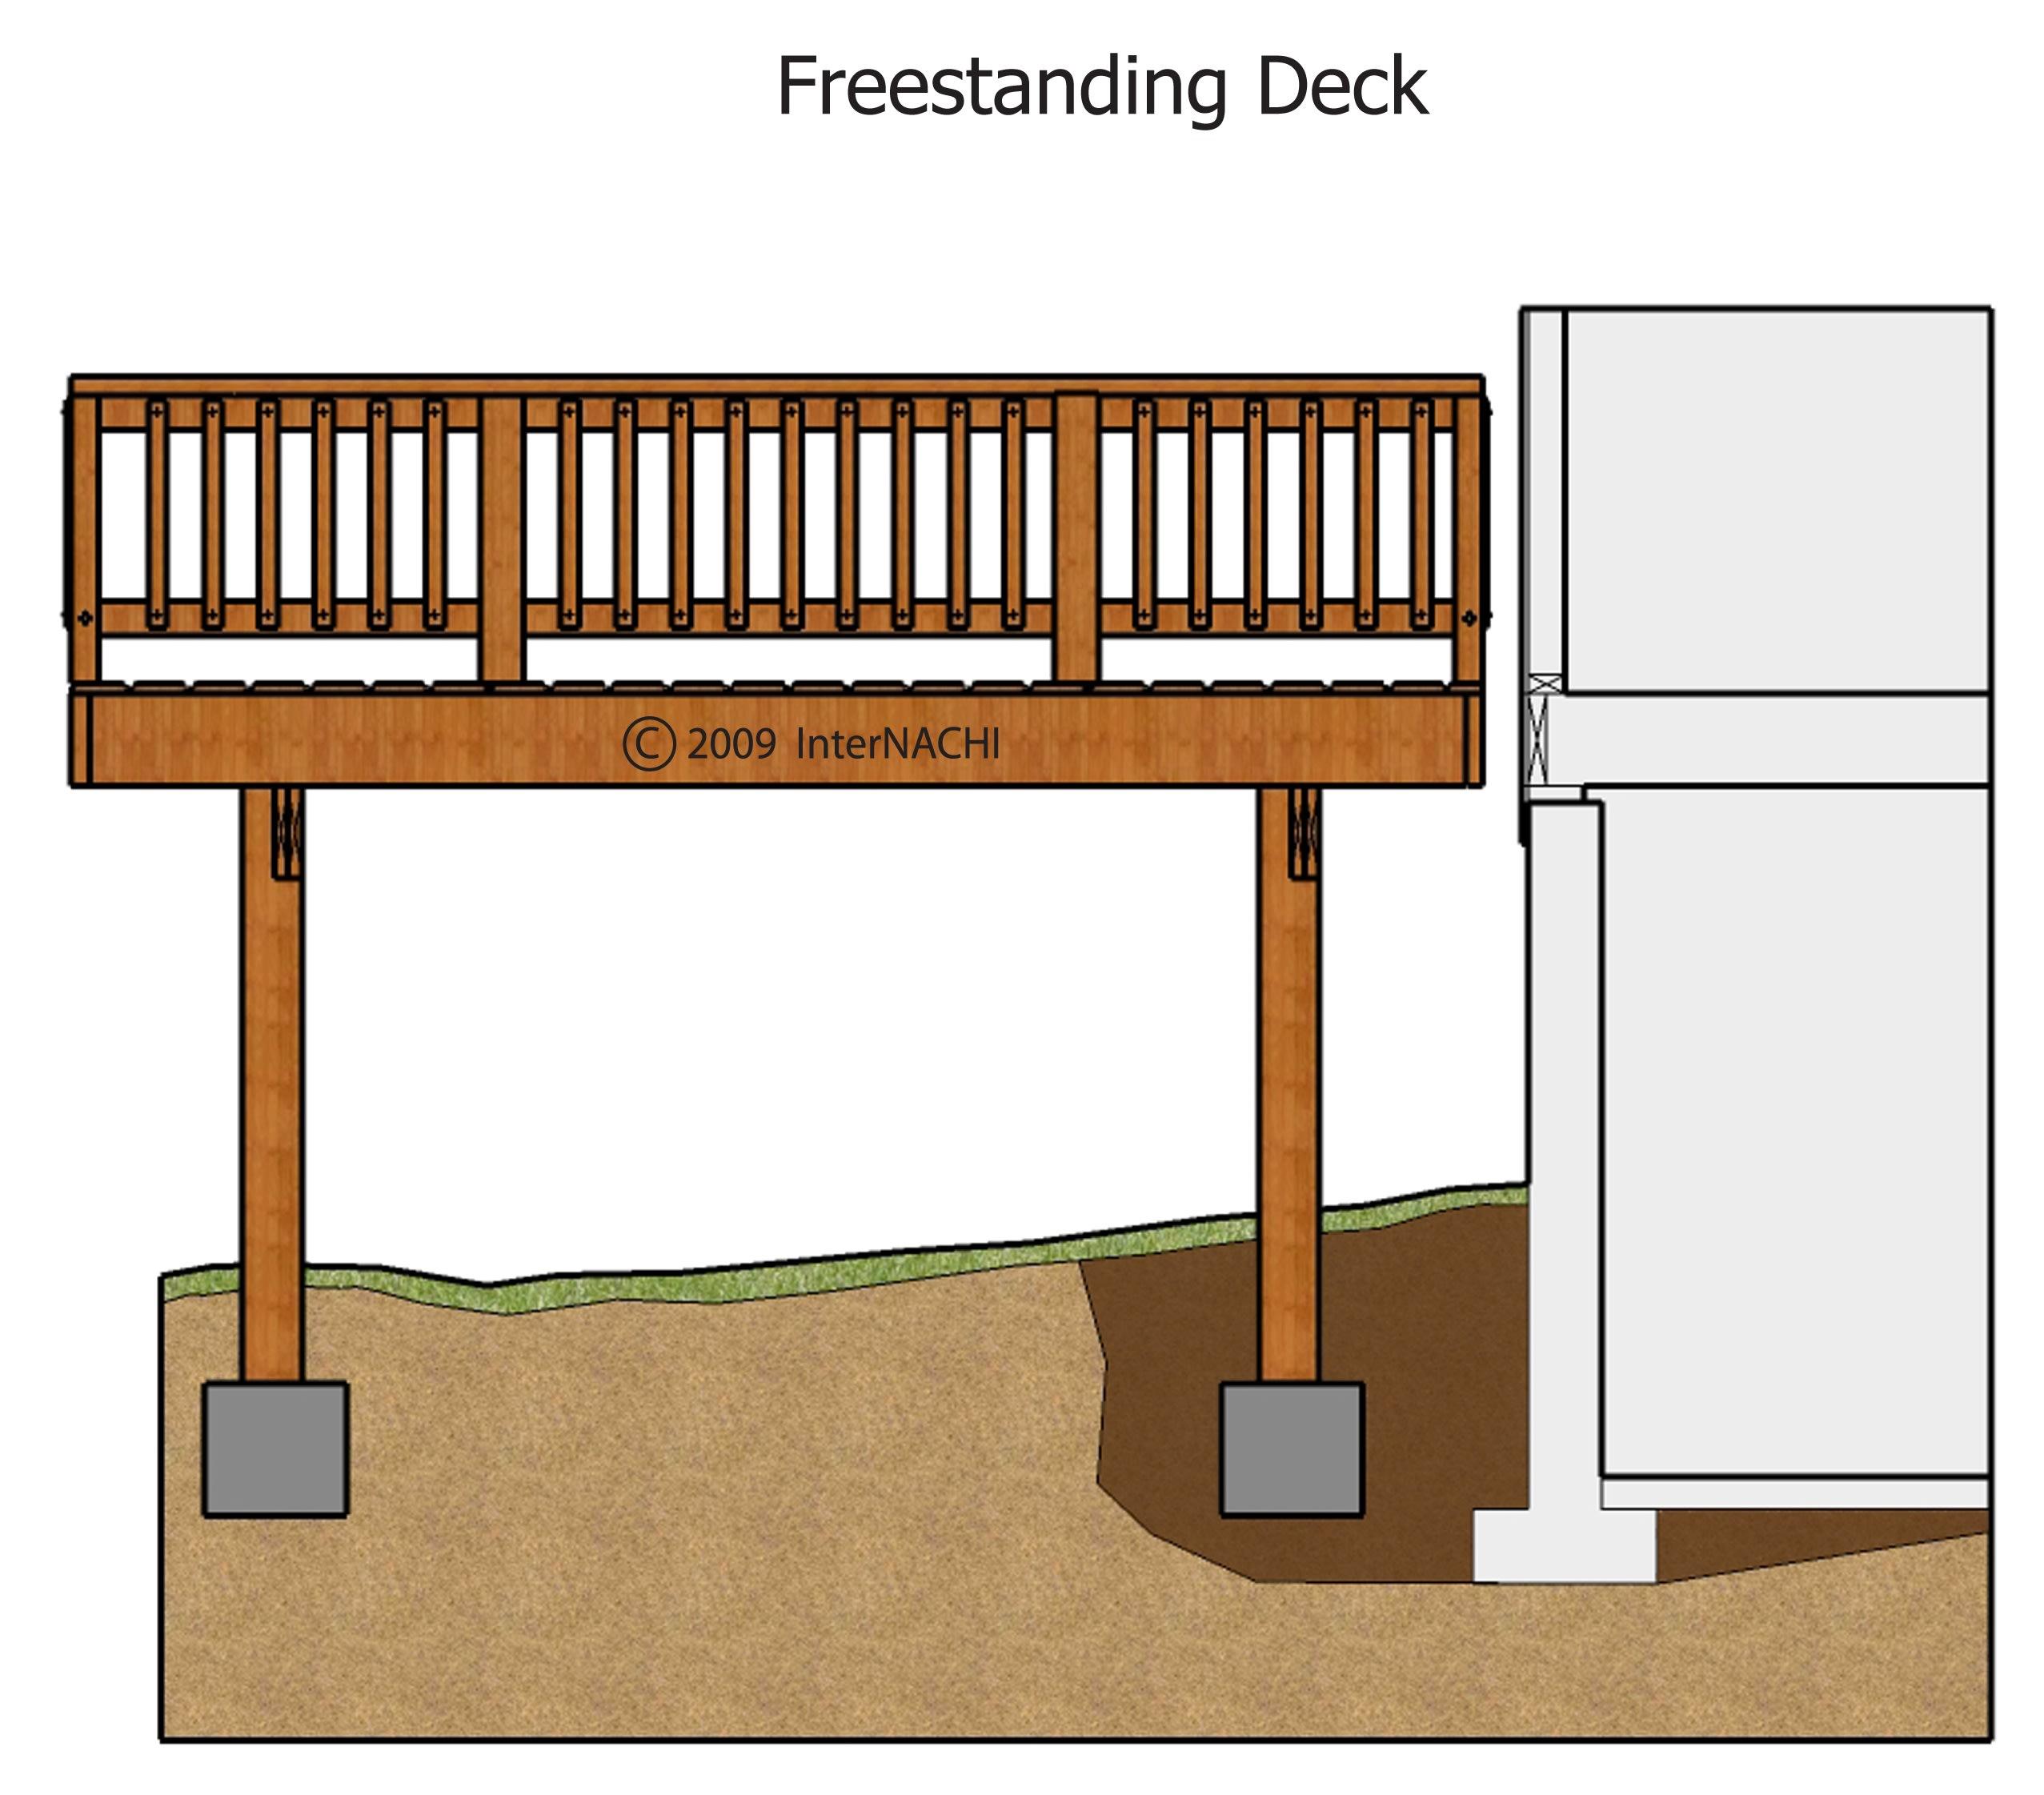 Freestanding deck - disturbed soil.